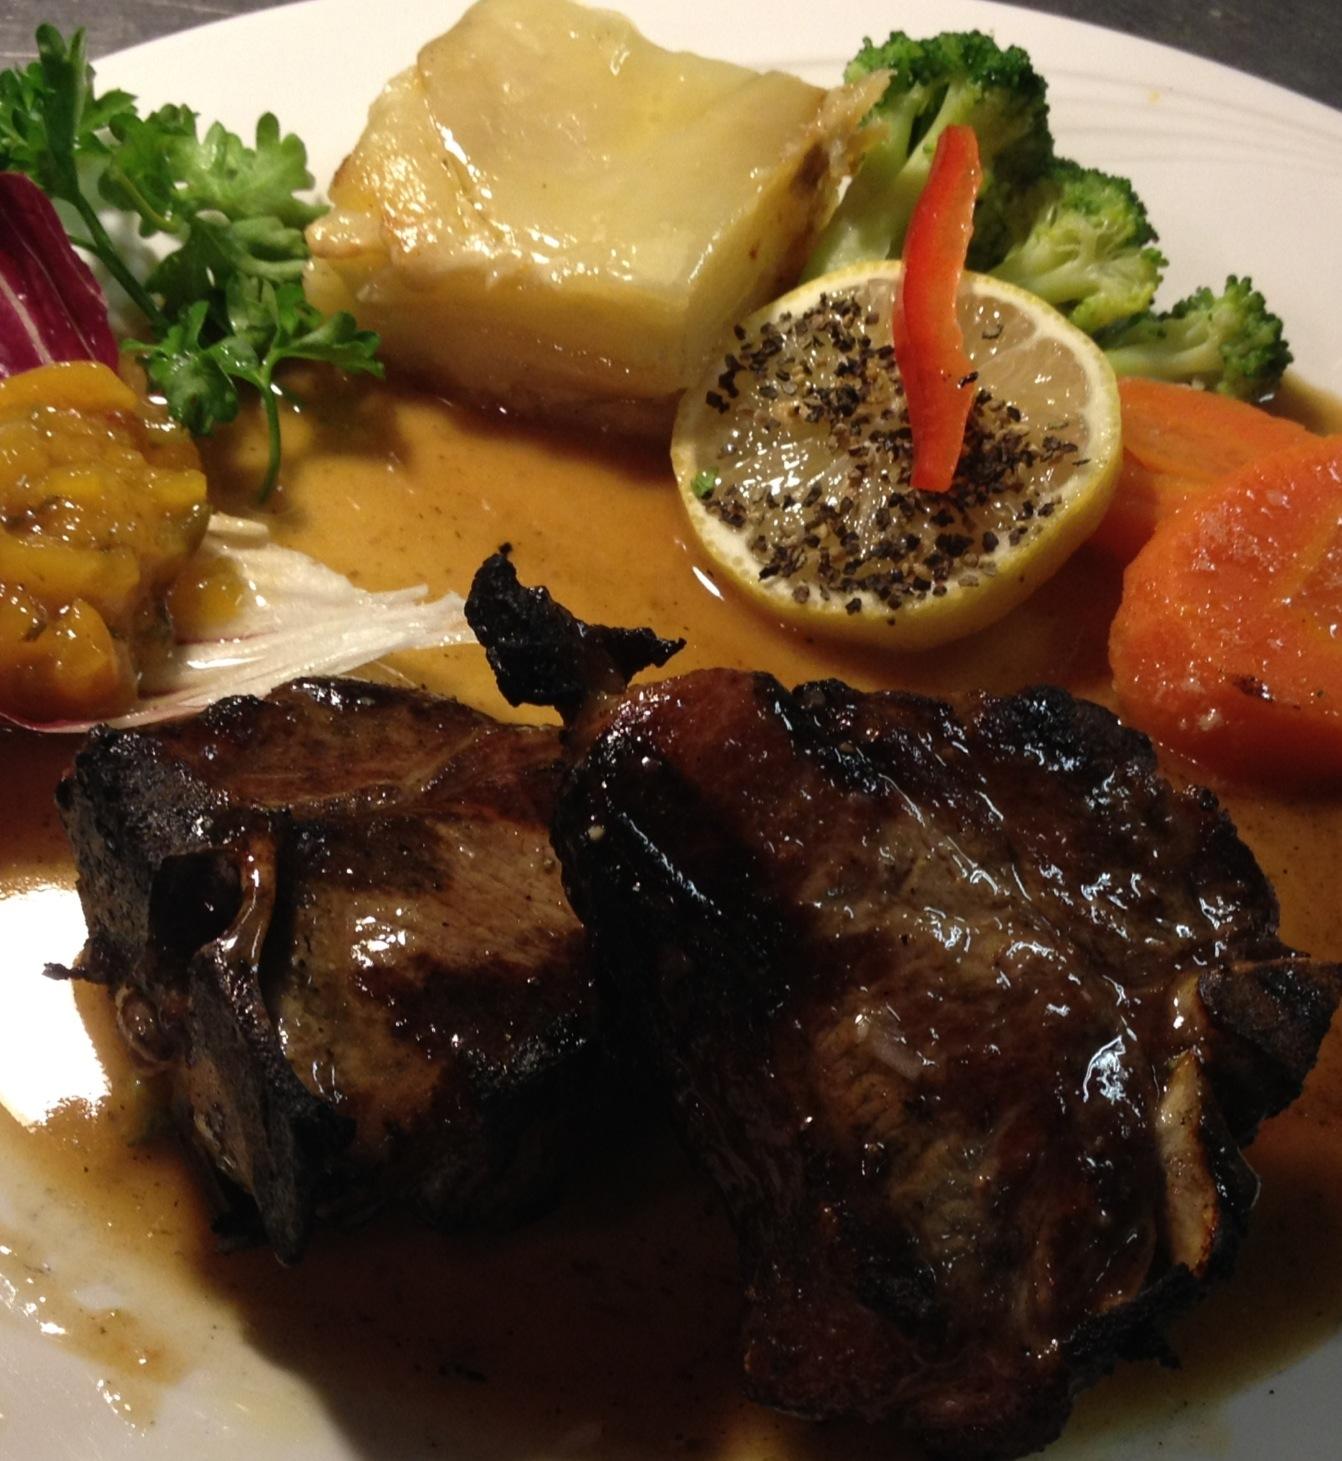 Pan-Seared Loin Lamb Chops with White Wine, Garlic,  Fresh Rosemary and Lemon...Demi-Glace'